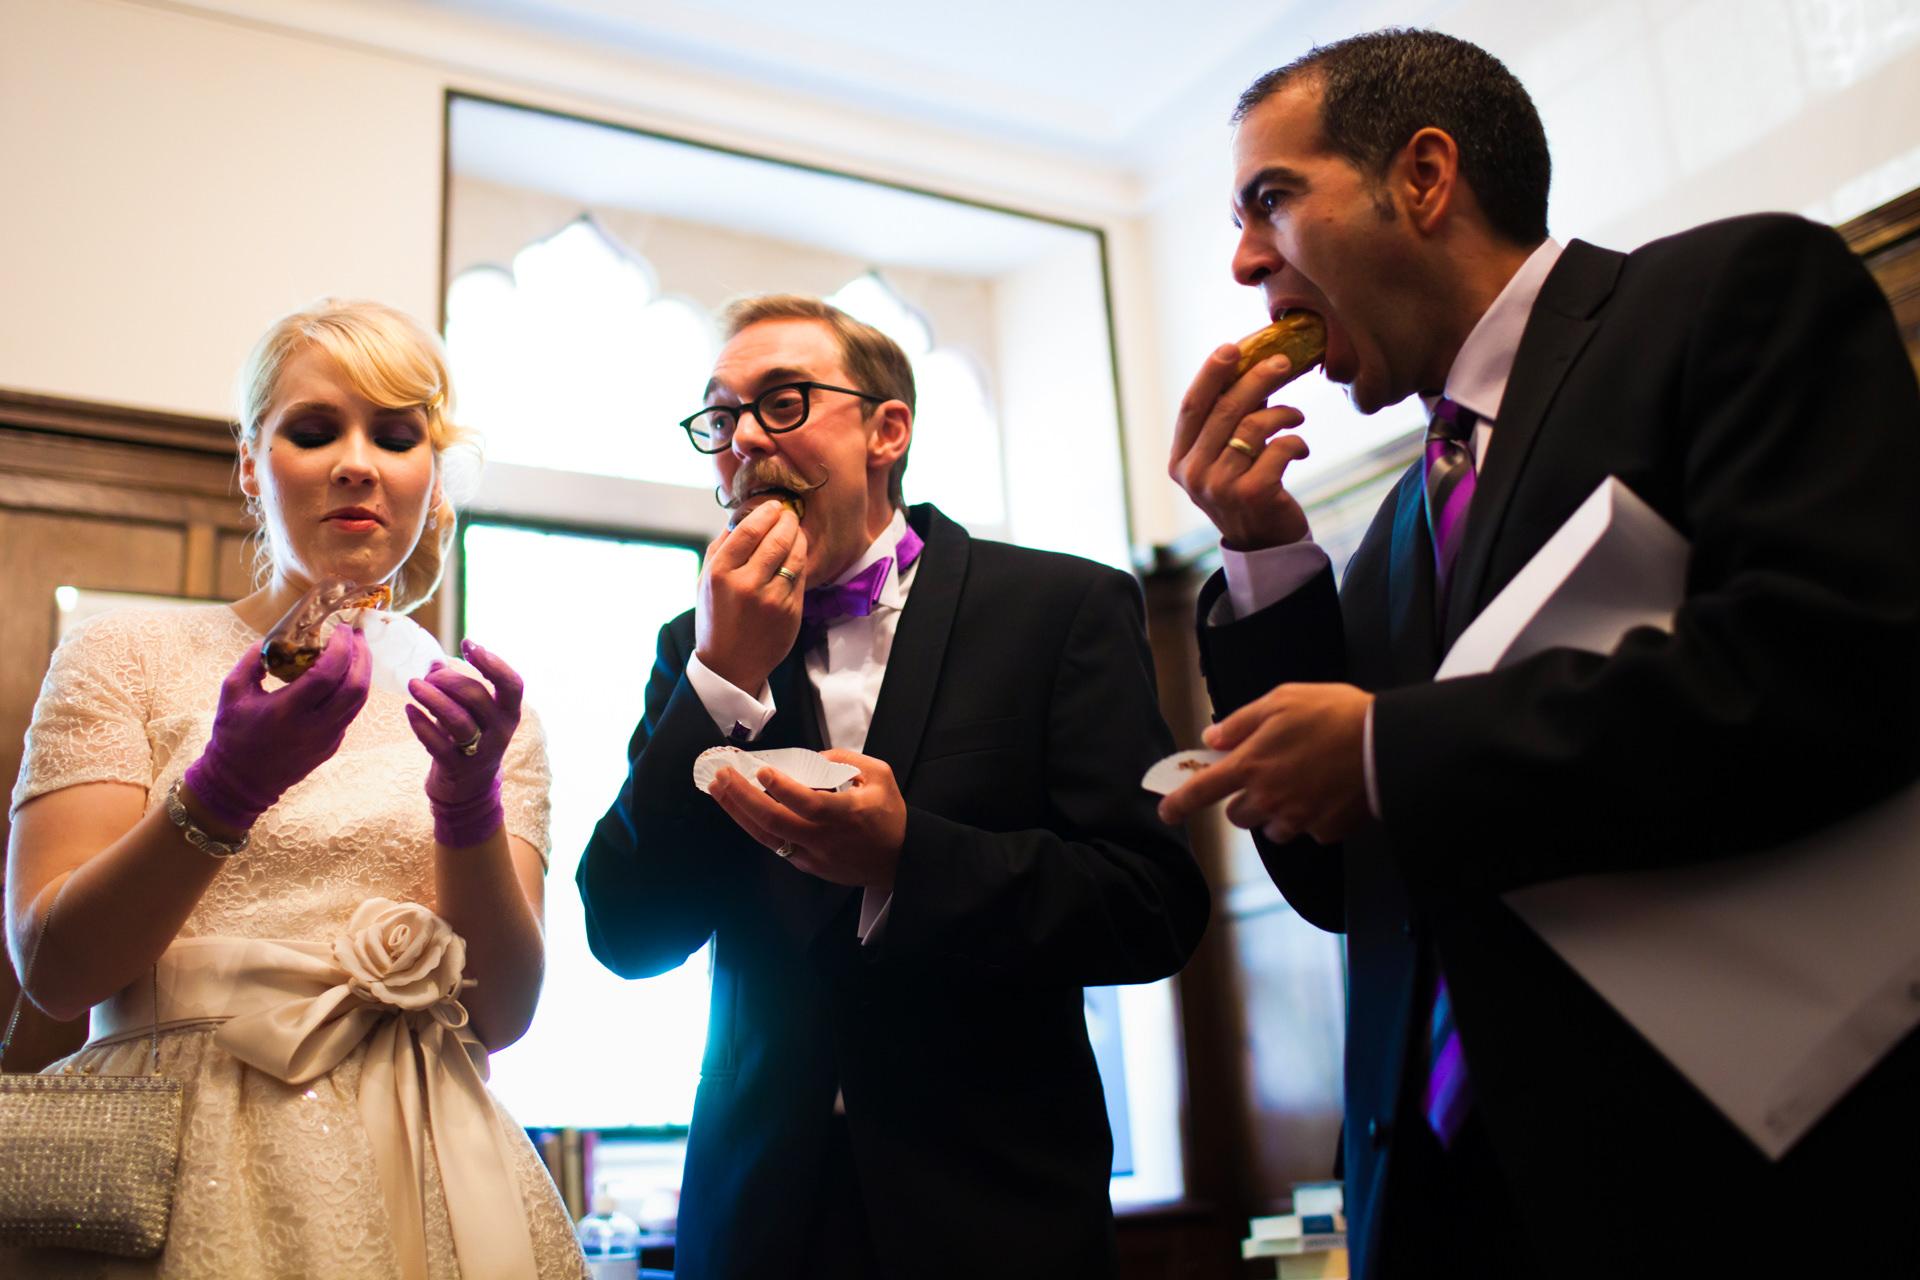 Paris, France Elopement Wedding Photo | Bride, groom, and friend sample the dessert